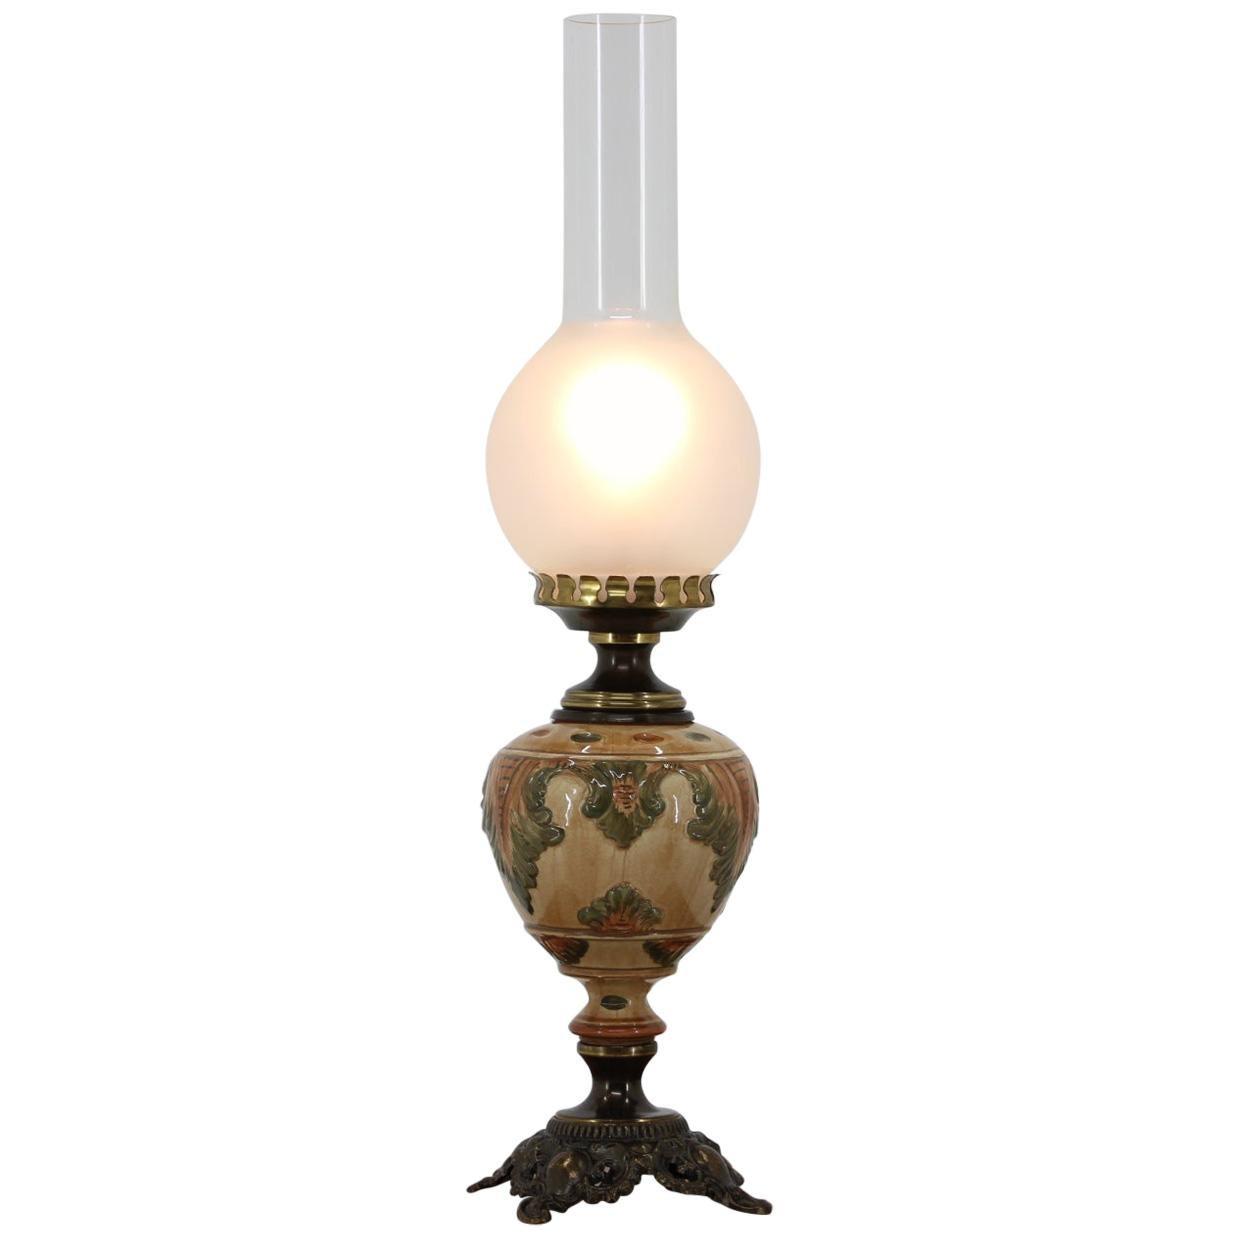 Porcelain Table Lamp, 1950s